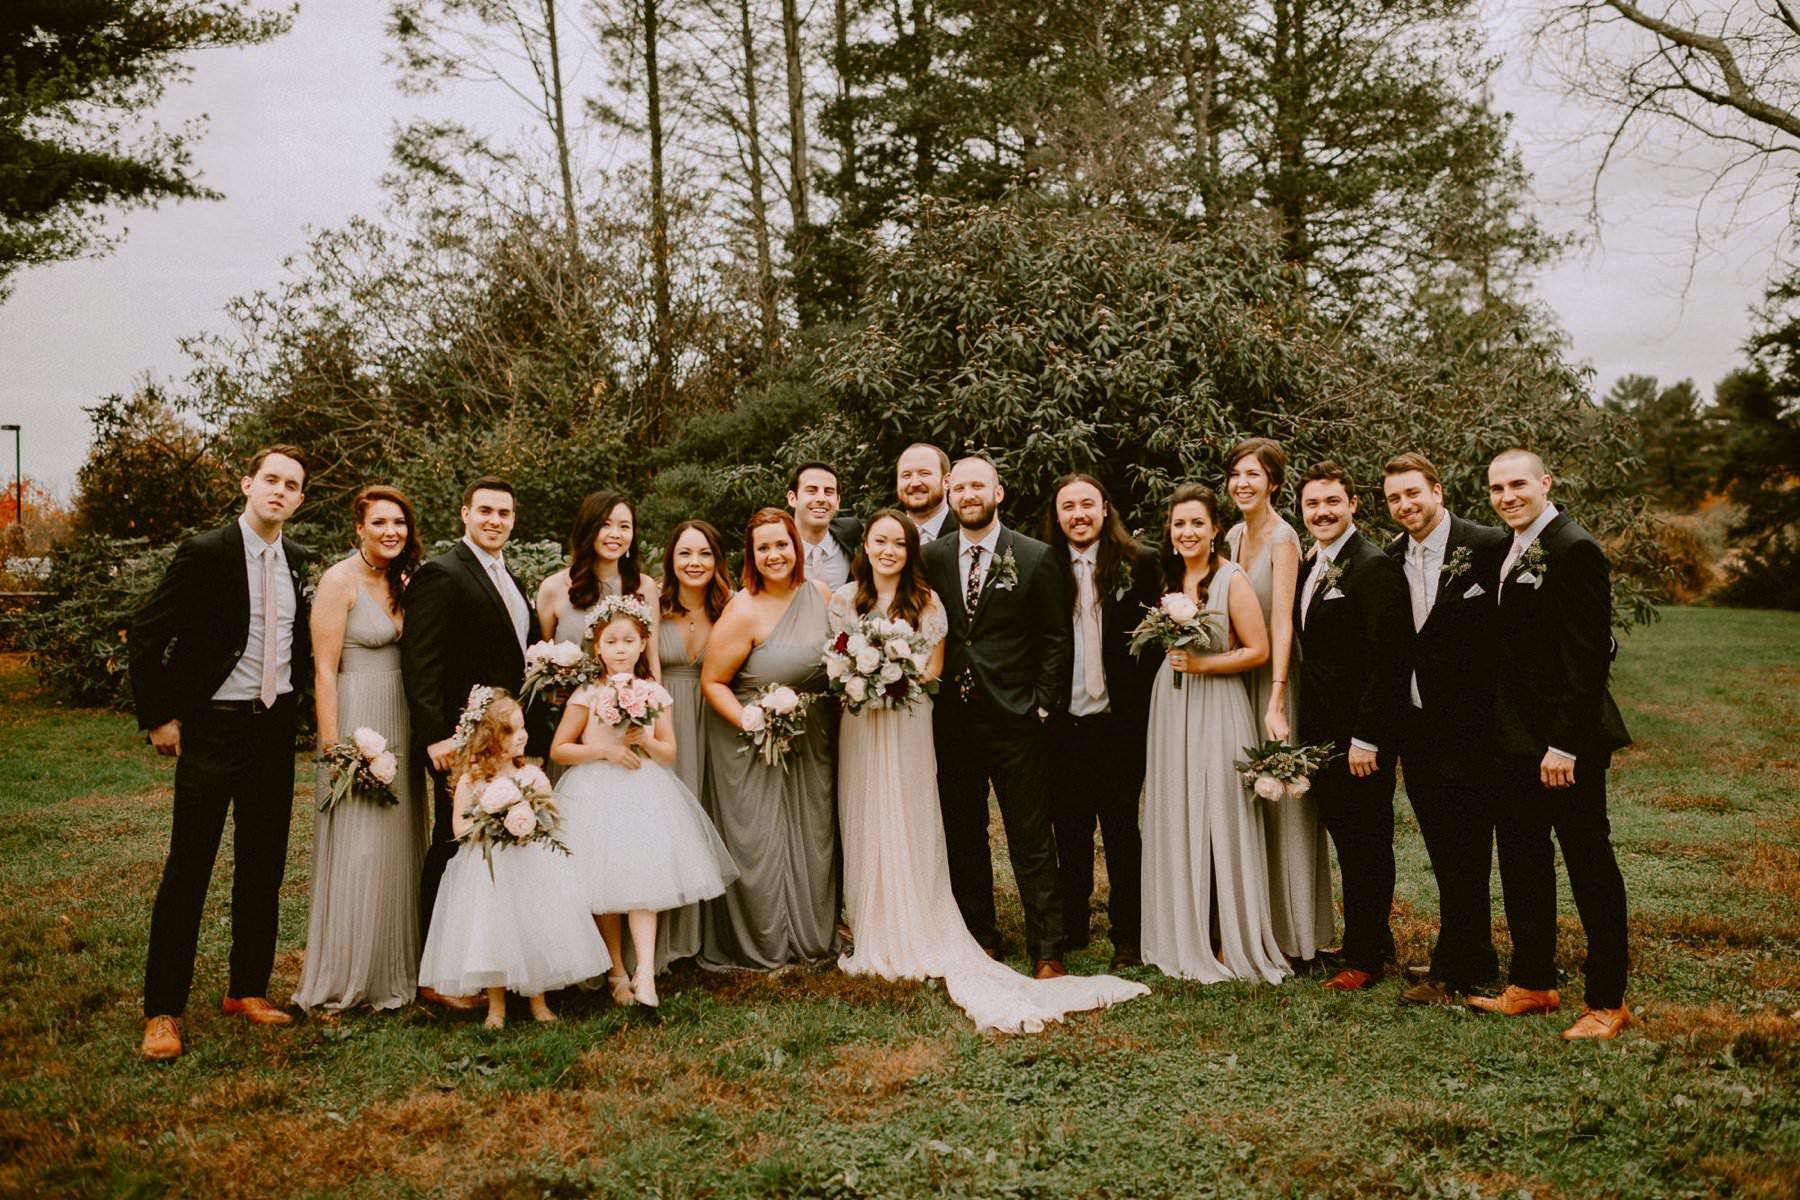 Tyler_arboretum_wedding-029.jpg